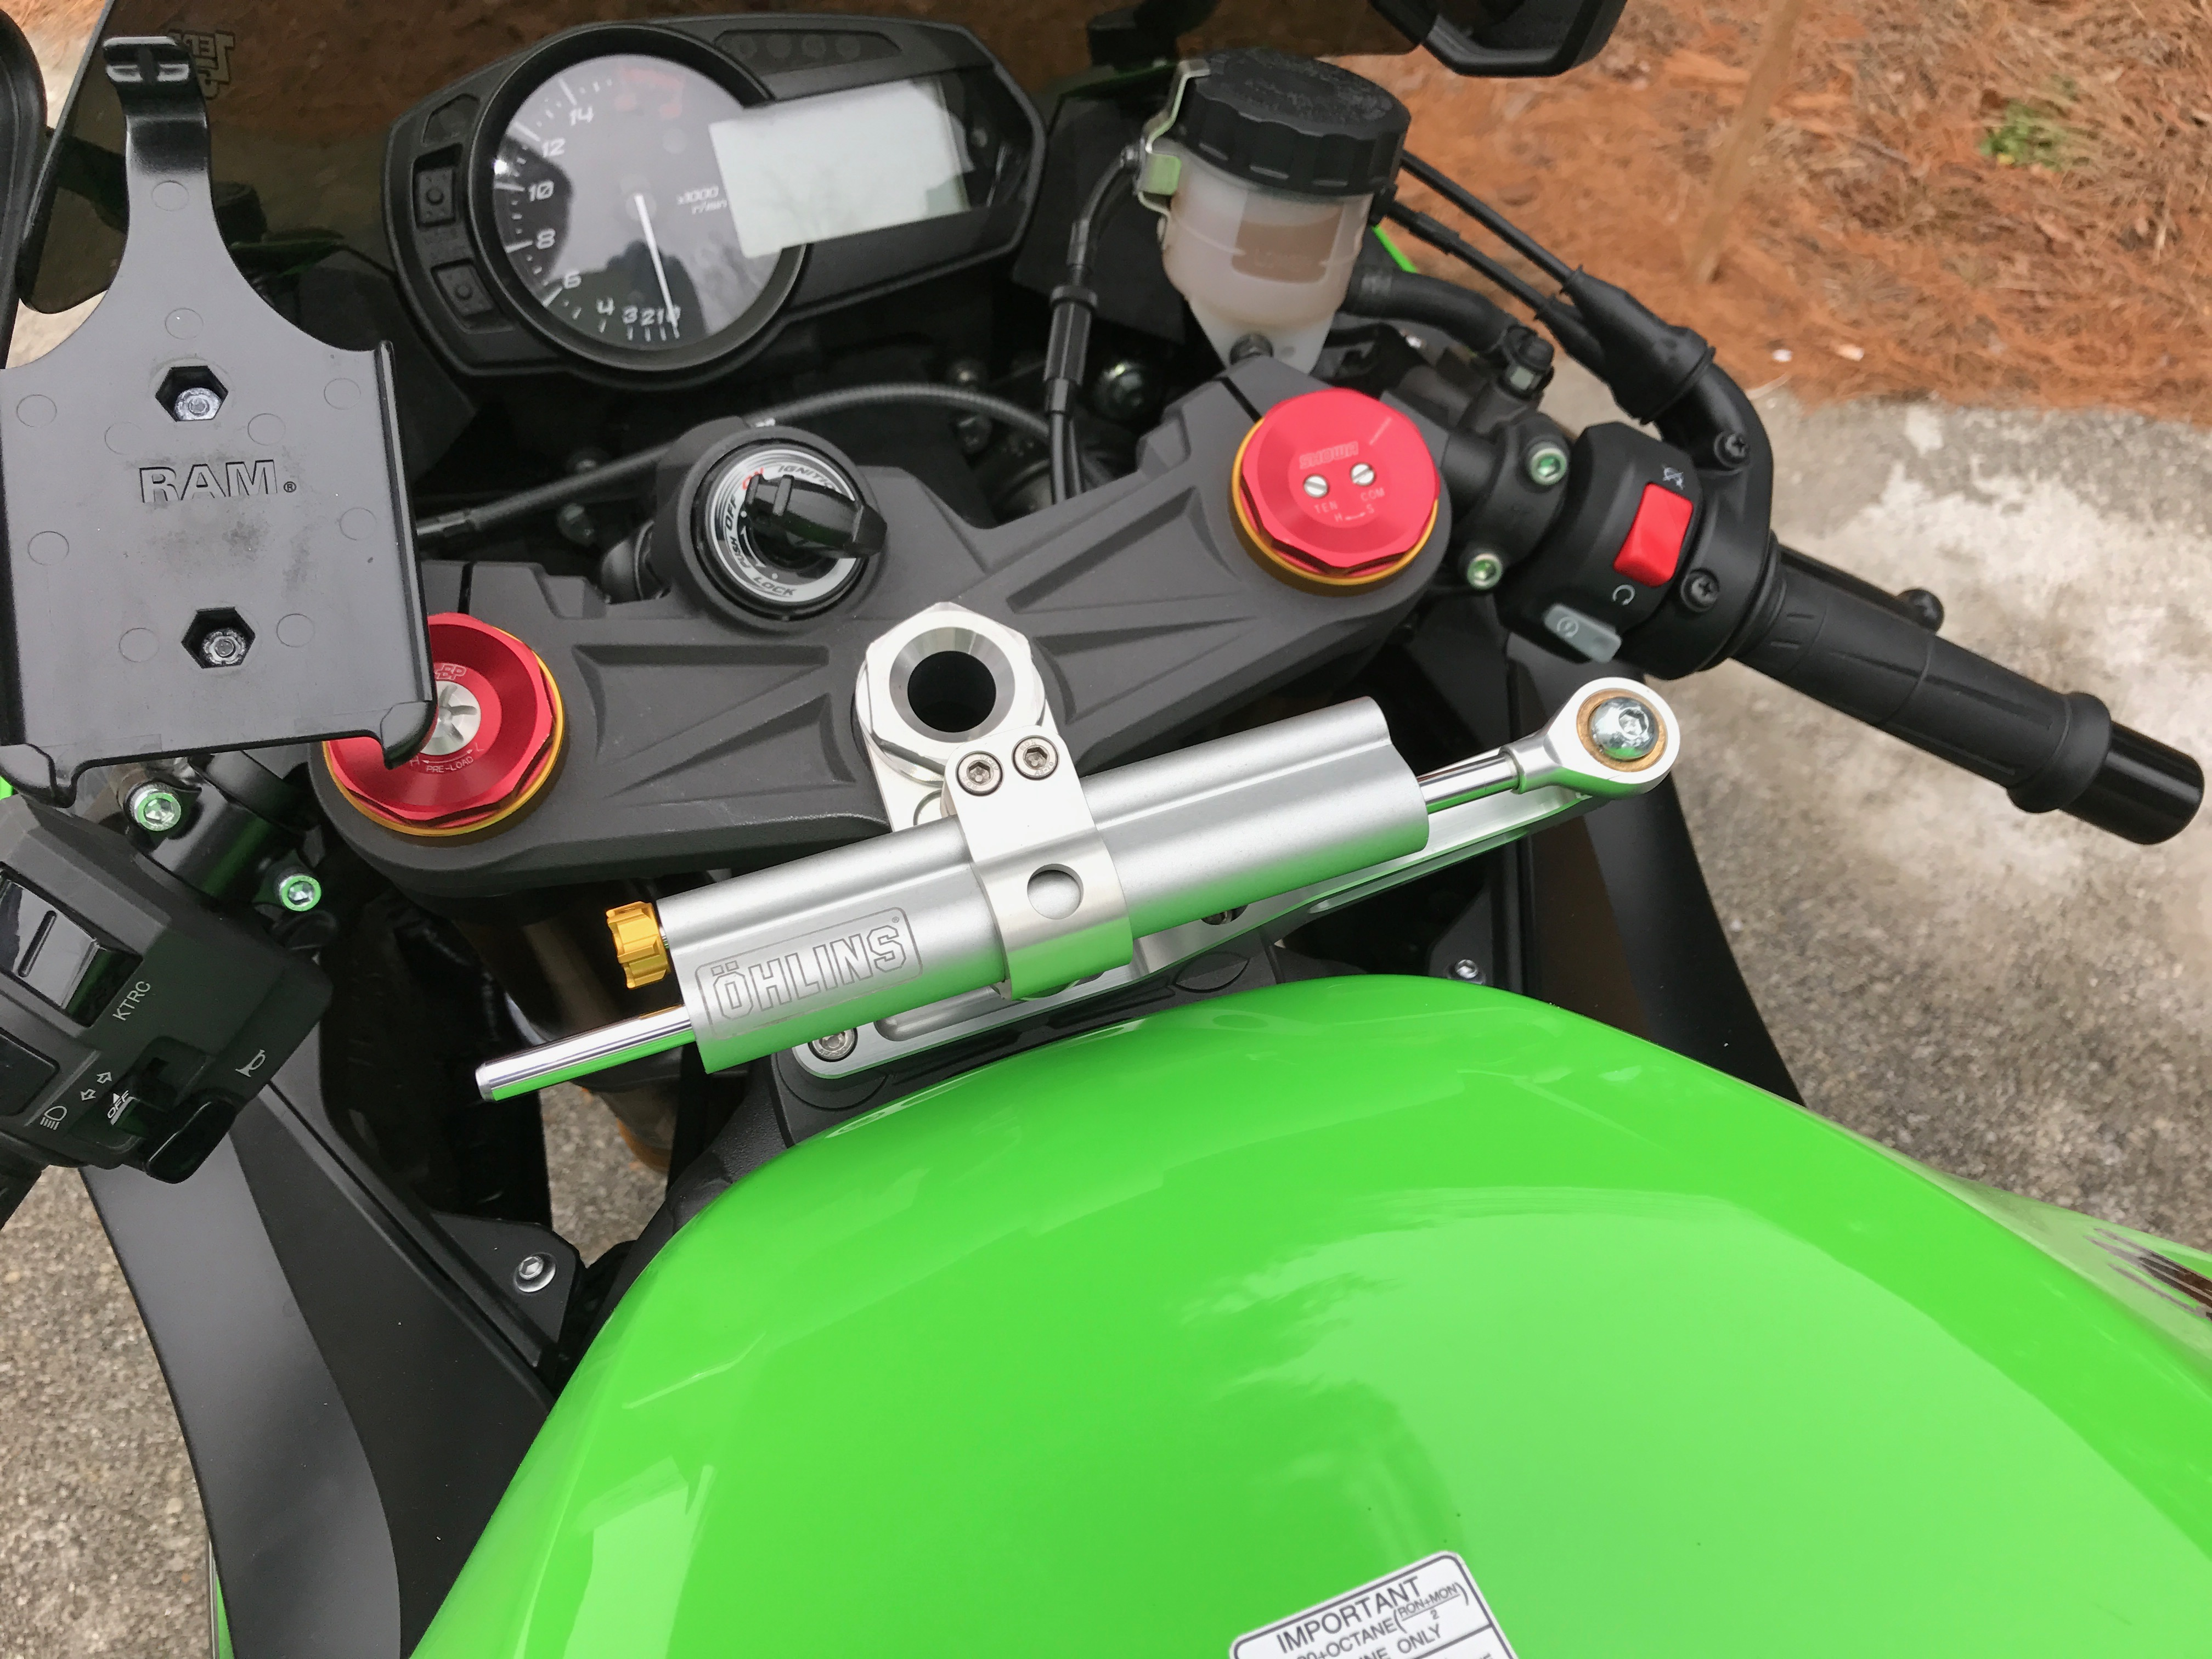 Is a steering damper necessary? - ZX6R Forum